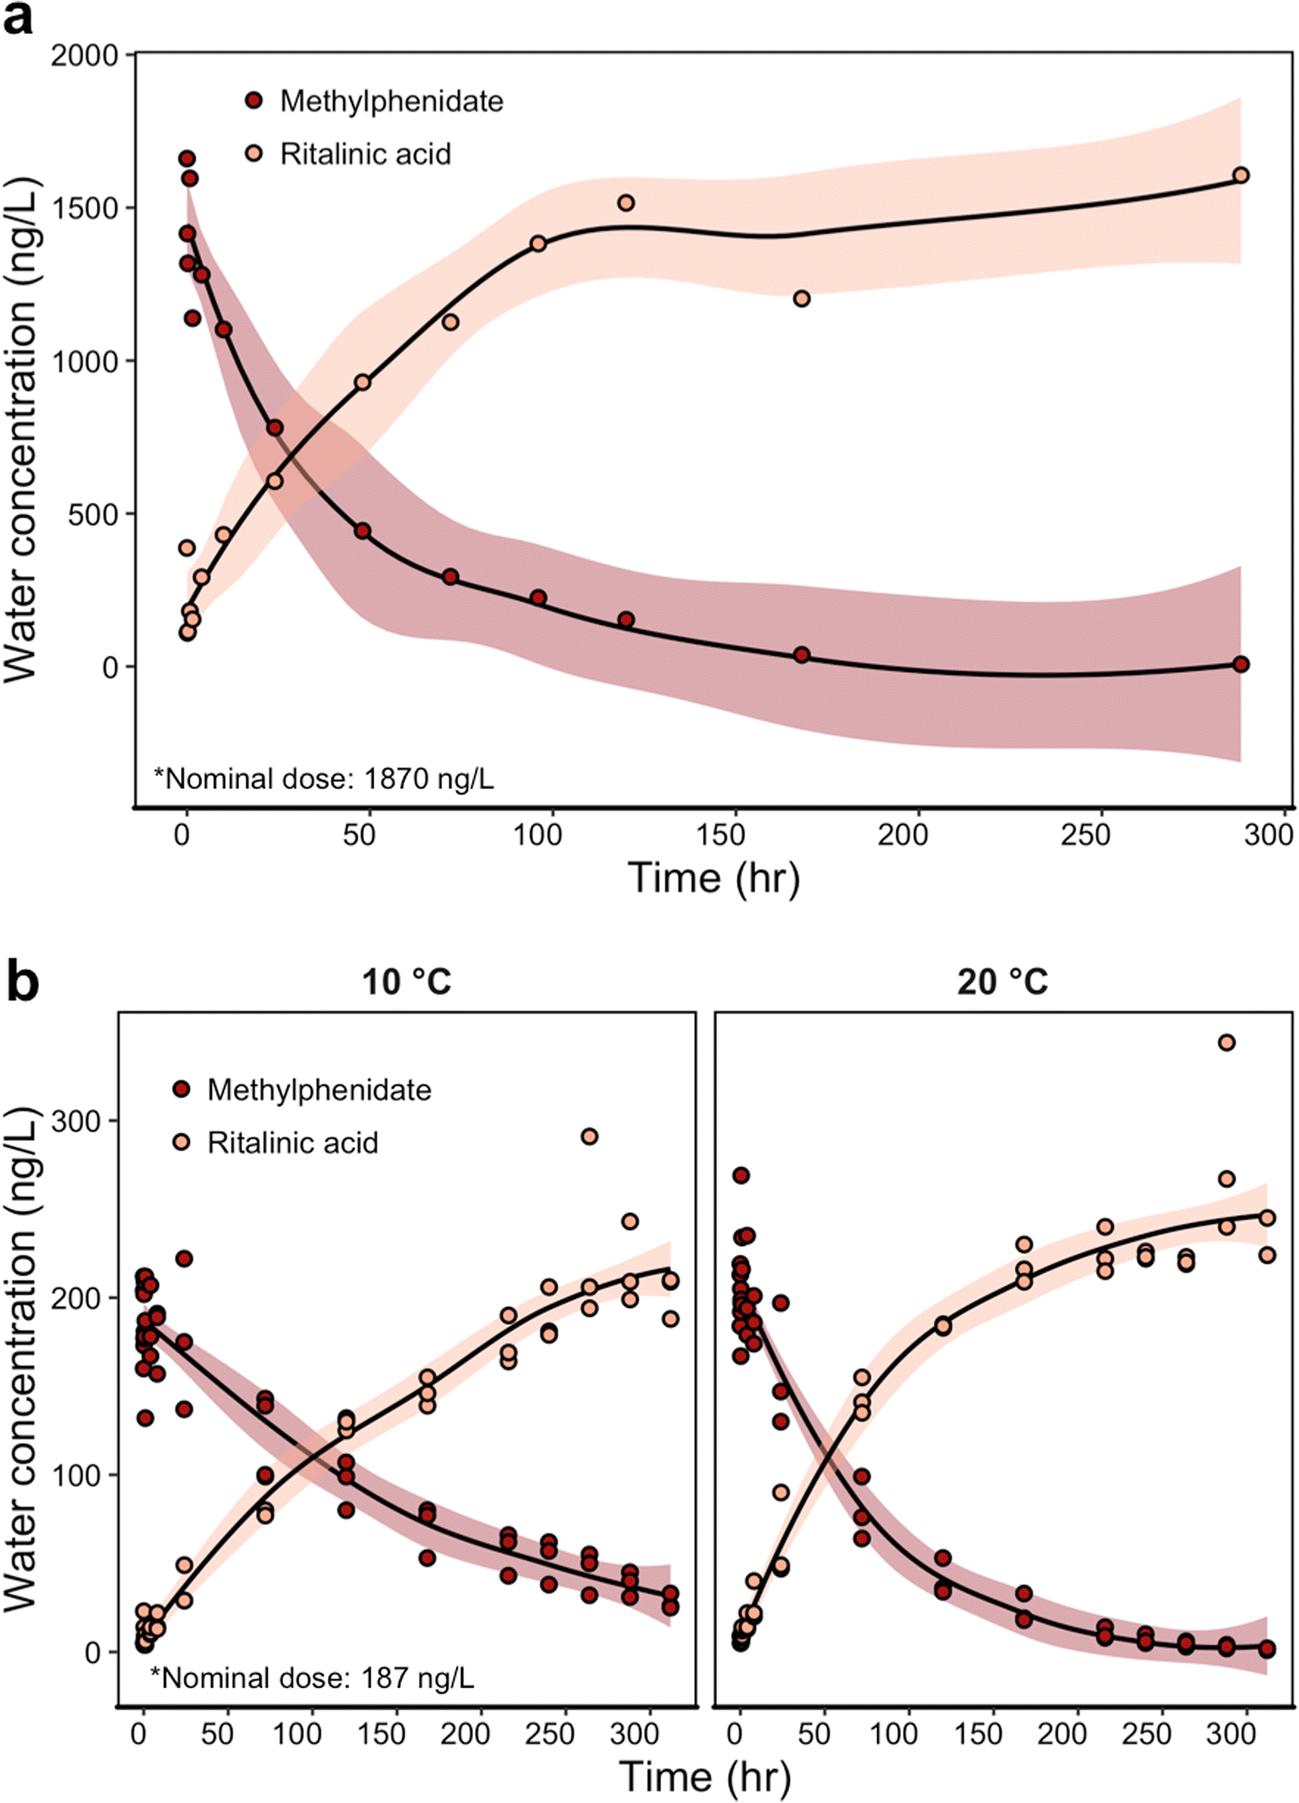 Stability and uptake of methylphenidate and ritalinic acid in nine